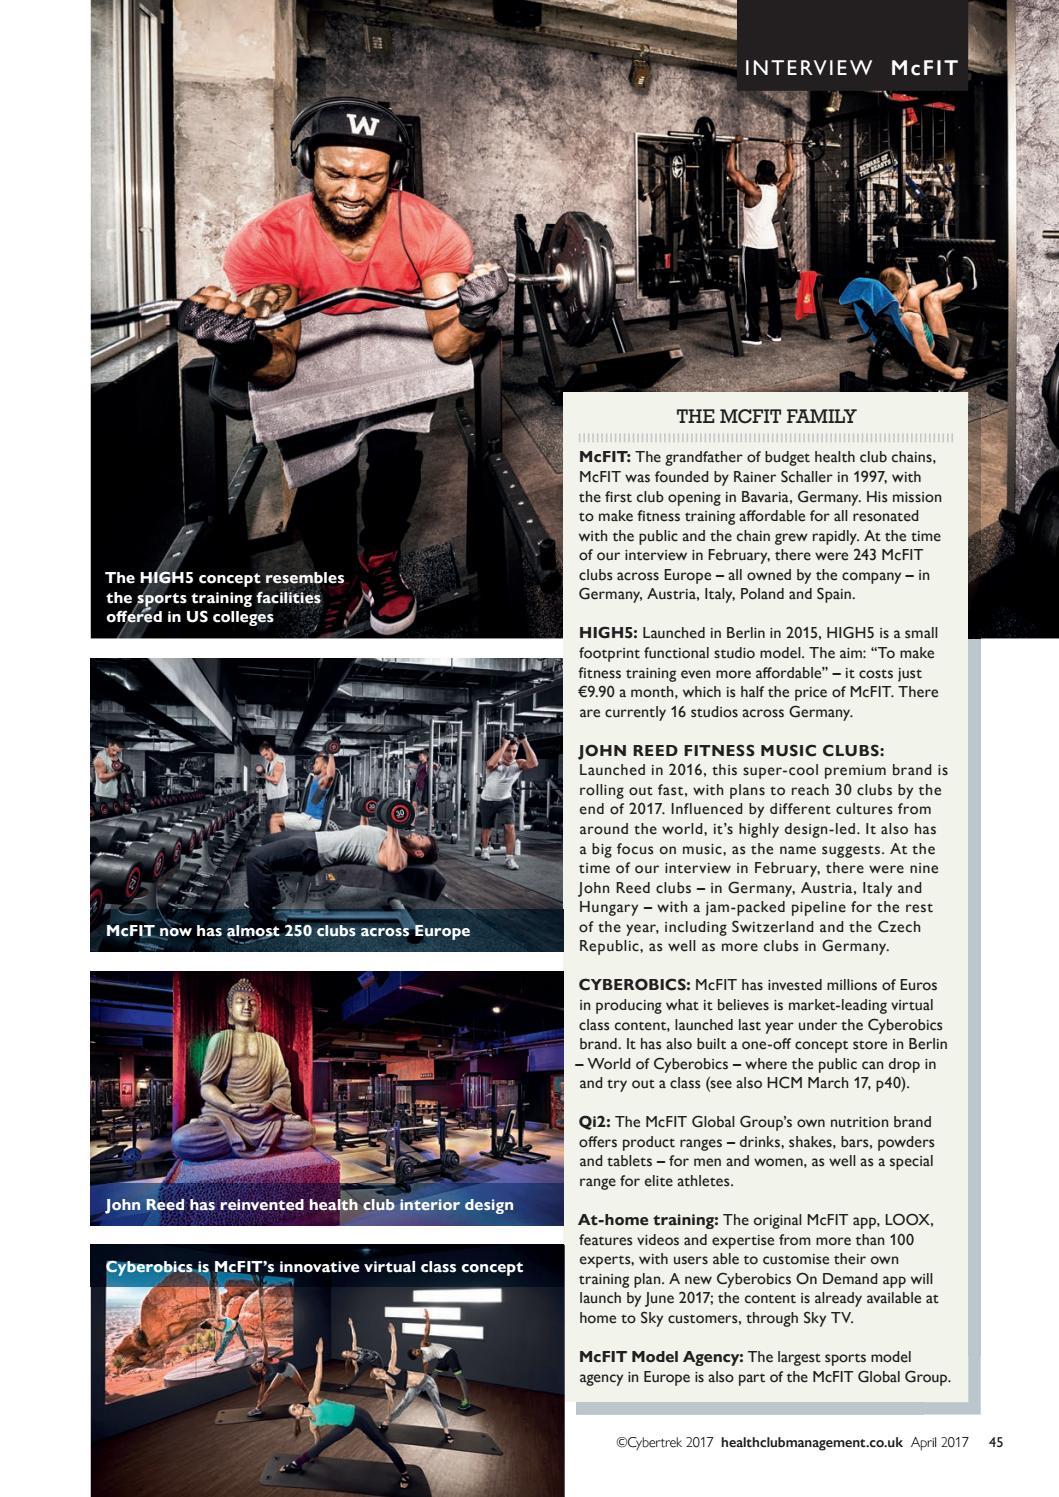 Health Club Management April 2017 by Leisure Media - issuu